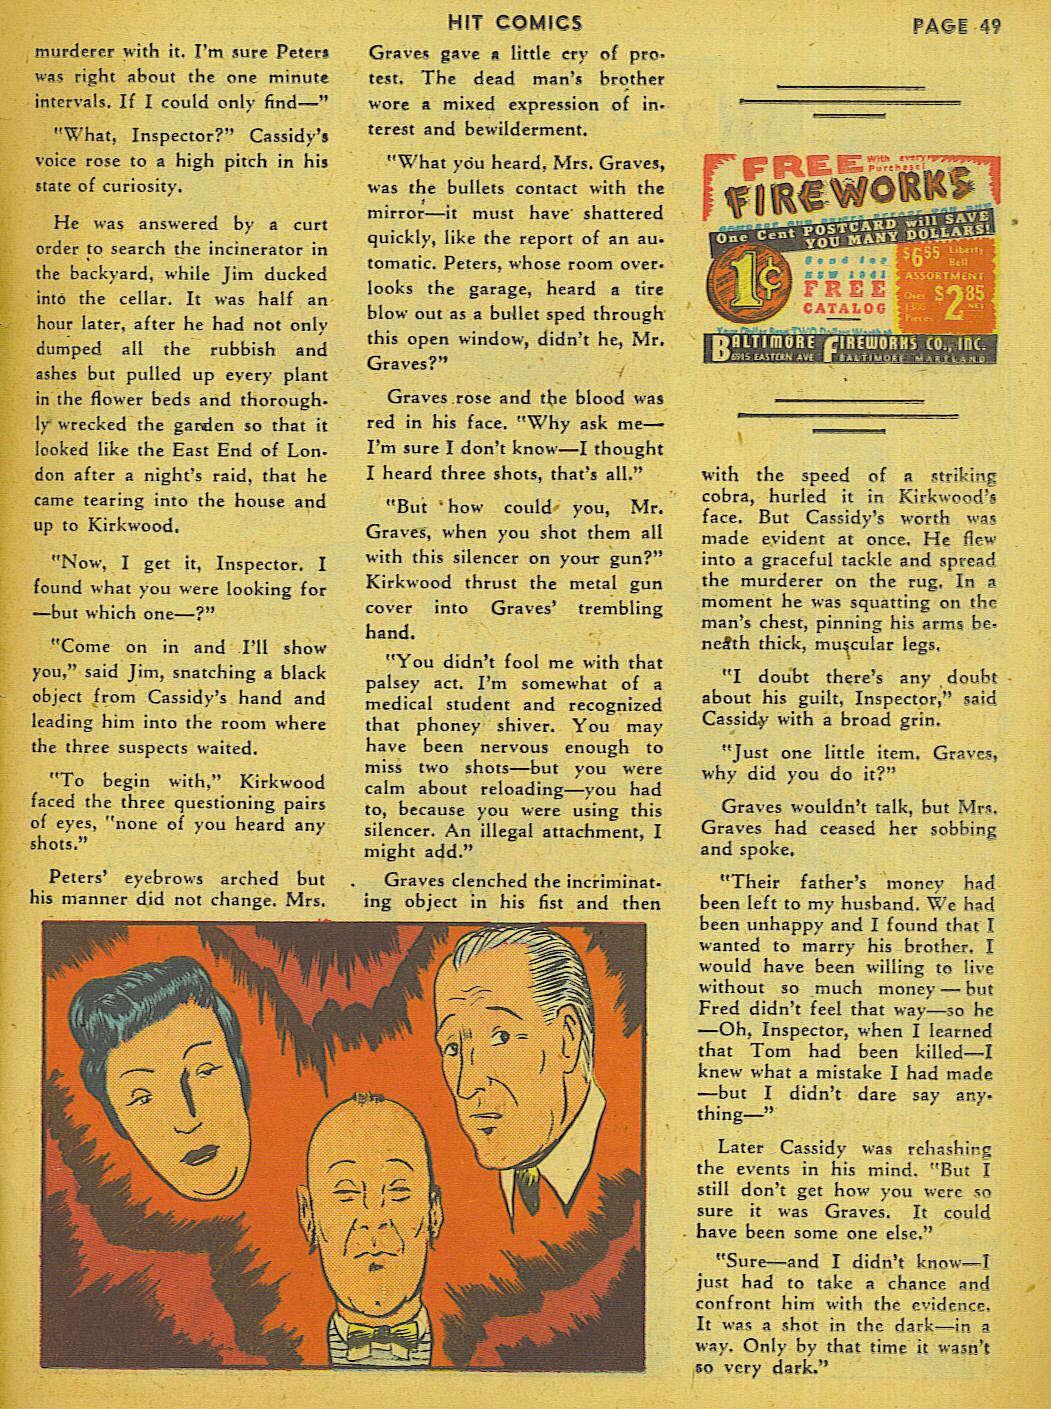 Read online Hit Comics comic -  Issue #13 - 51